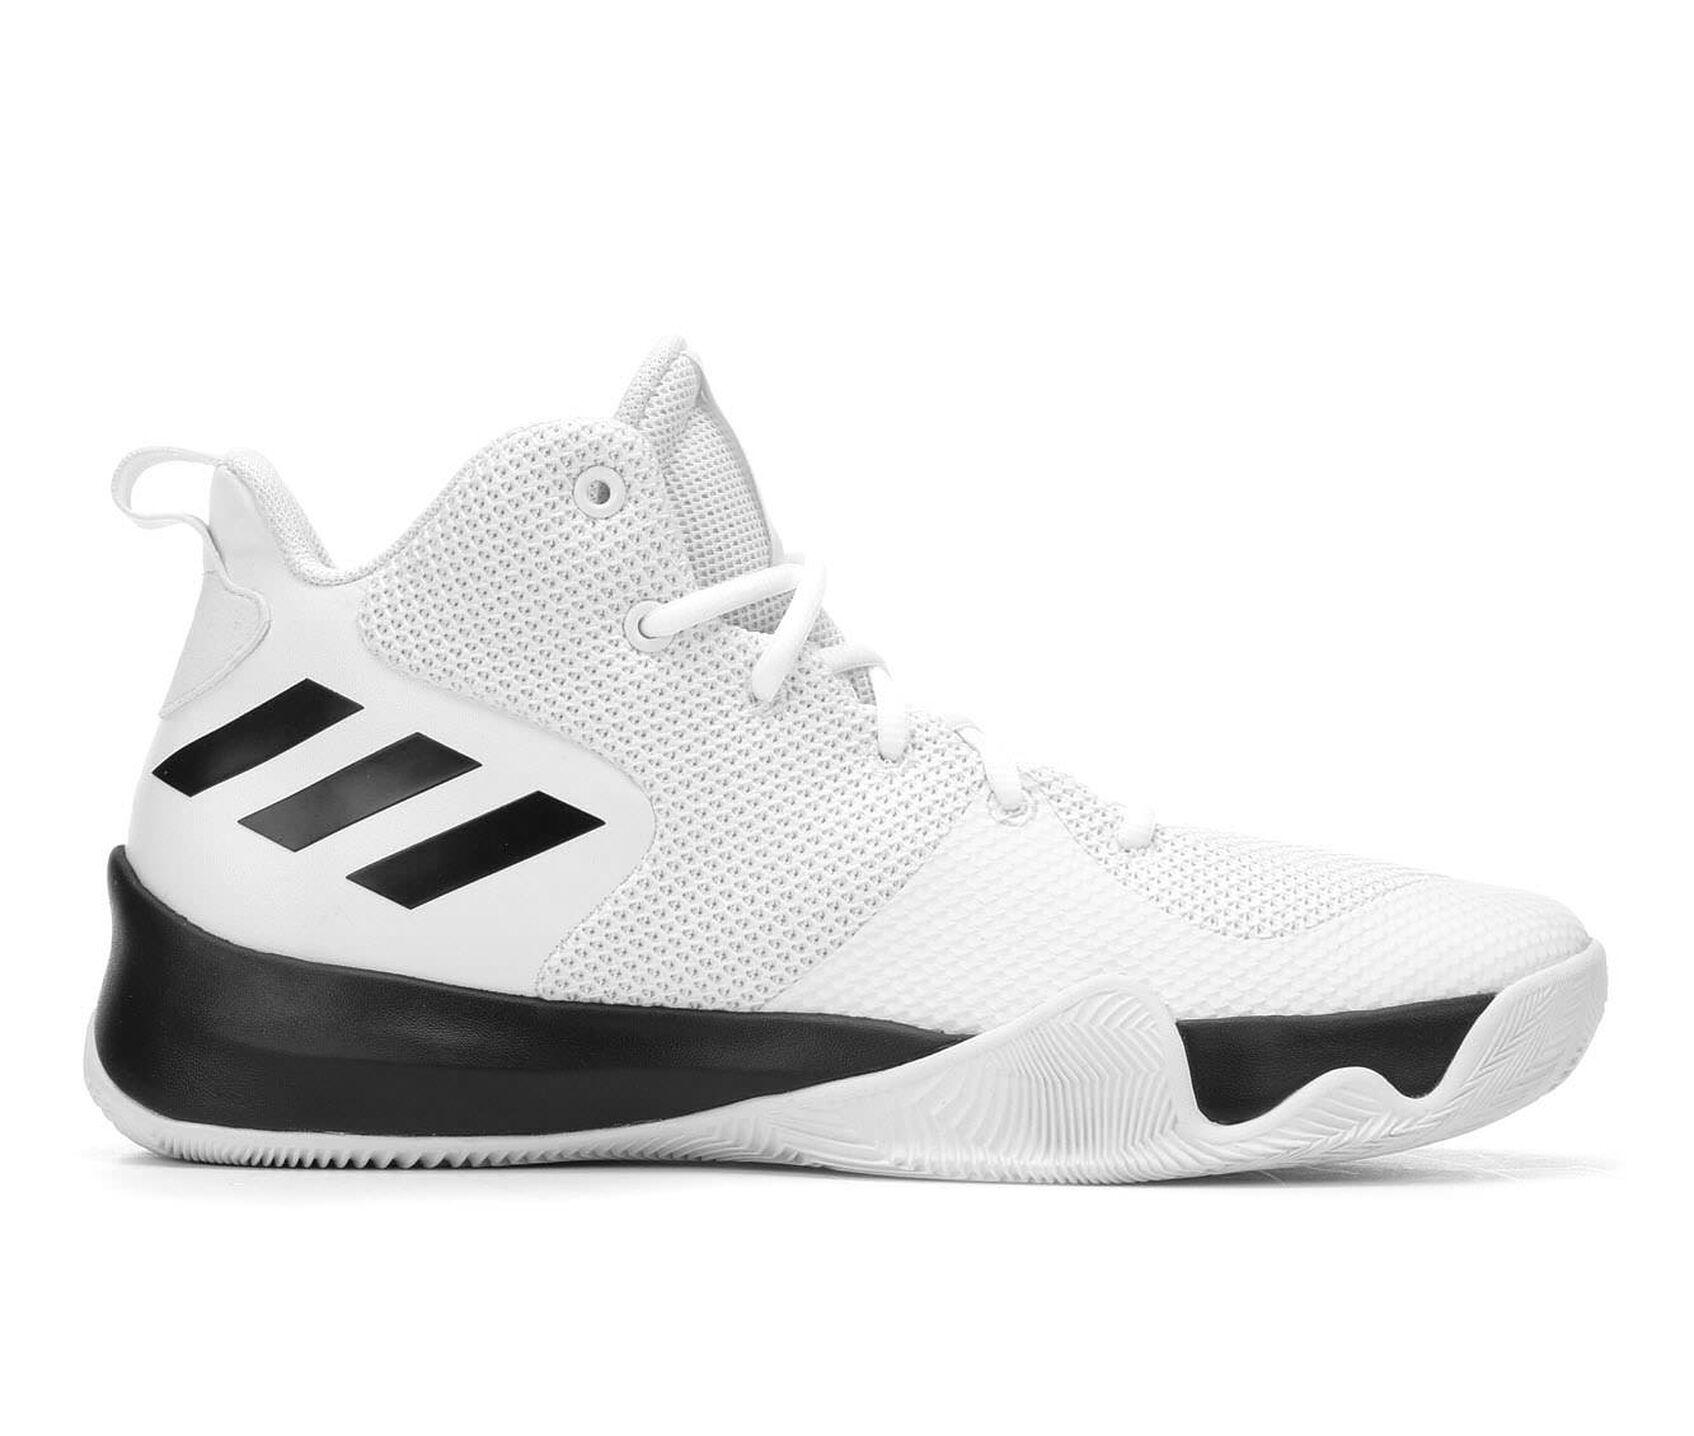 379834a7d Adidas Explosive Flash High Top Basketball Shoes.